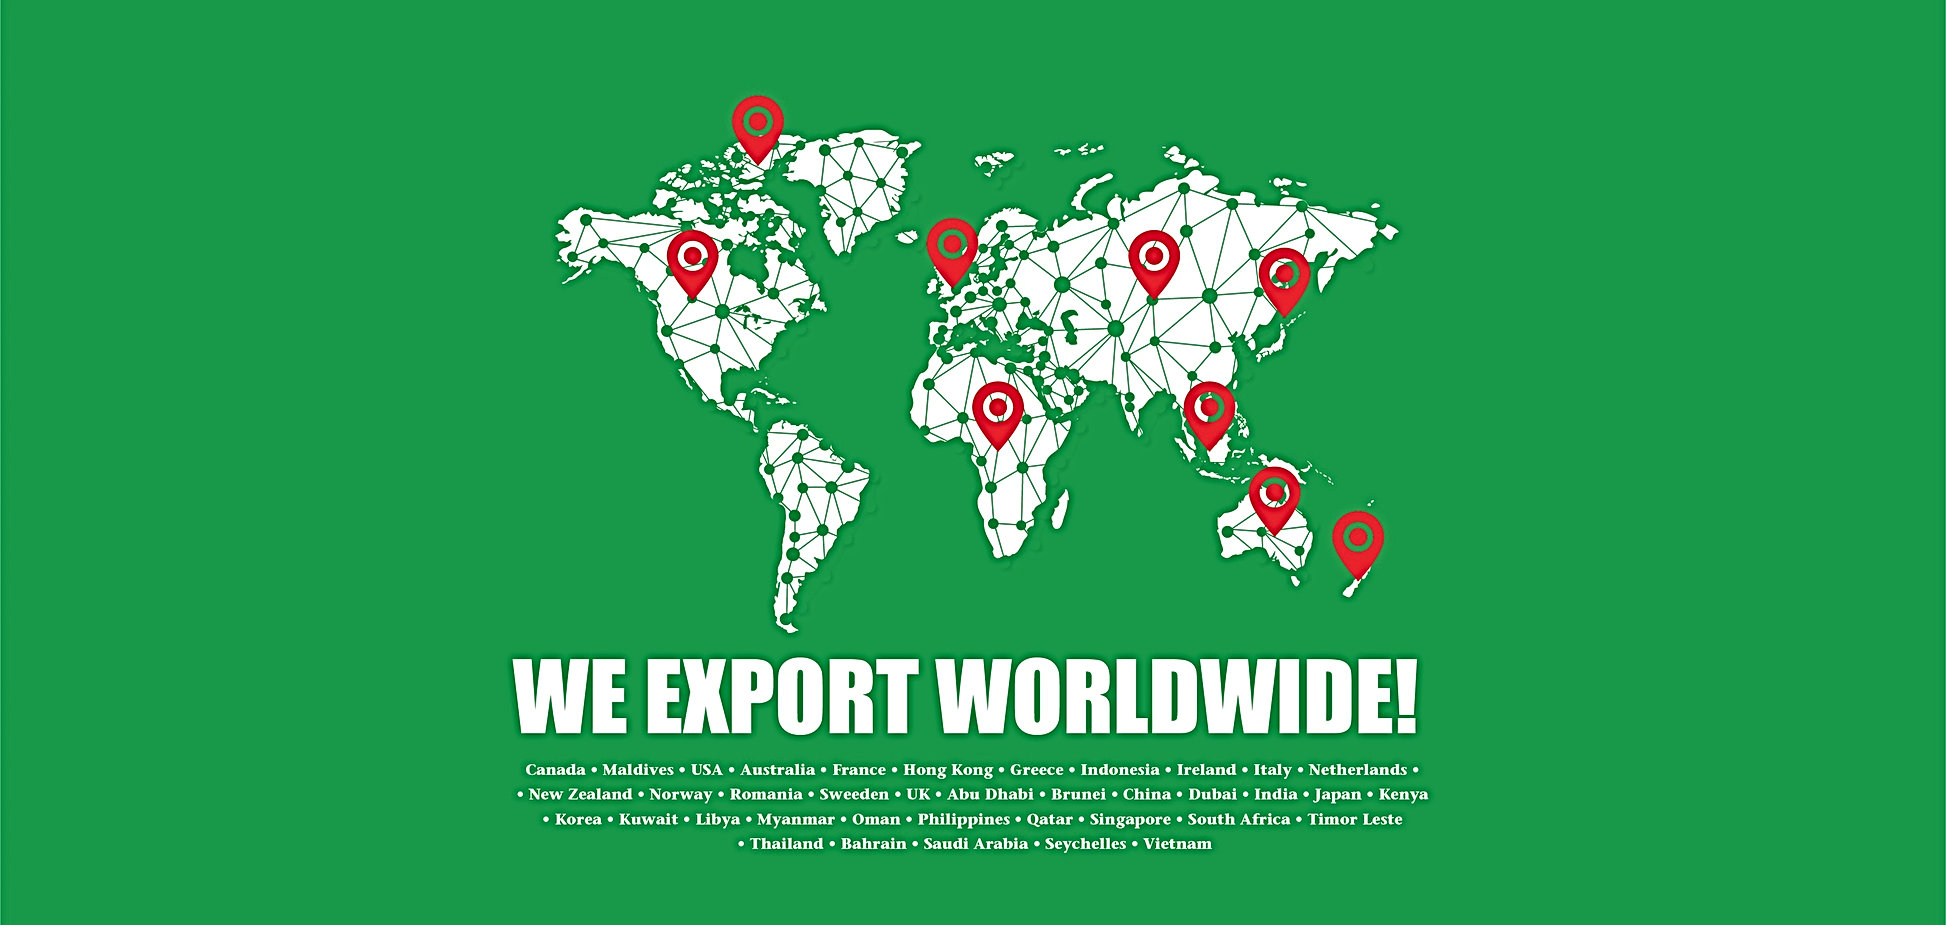 Kawan-Food-Global-Export-FA-Green.jpg